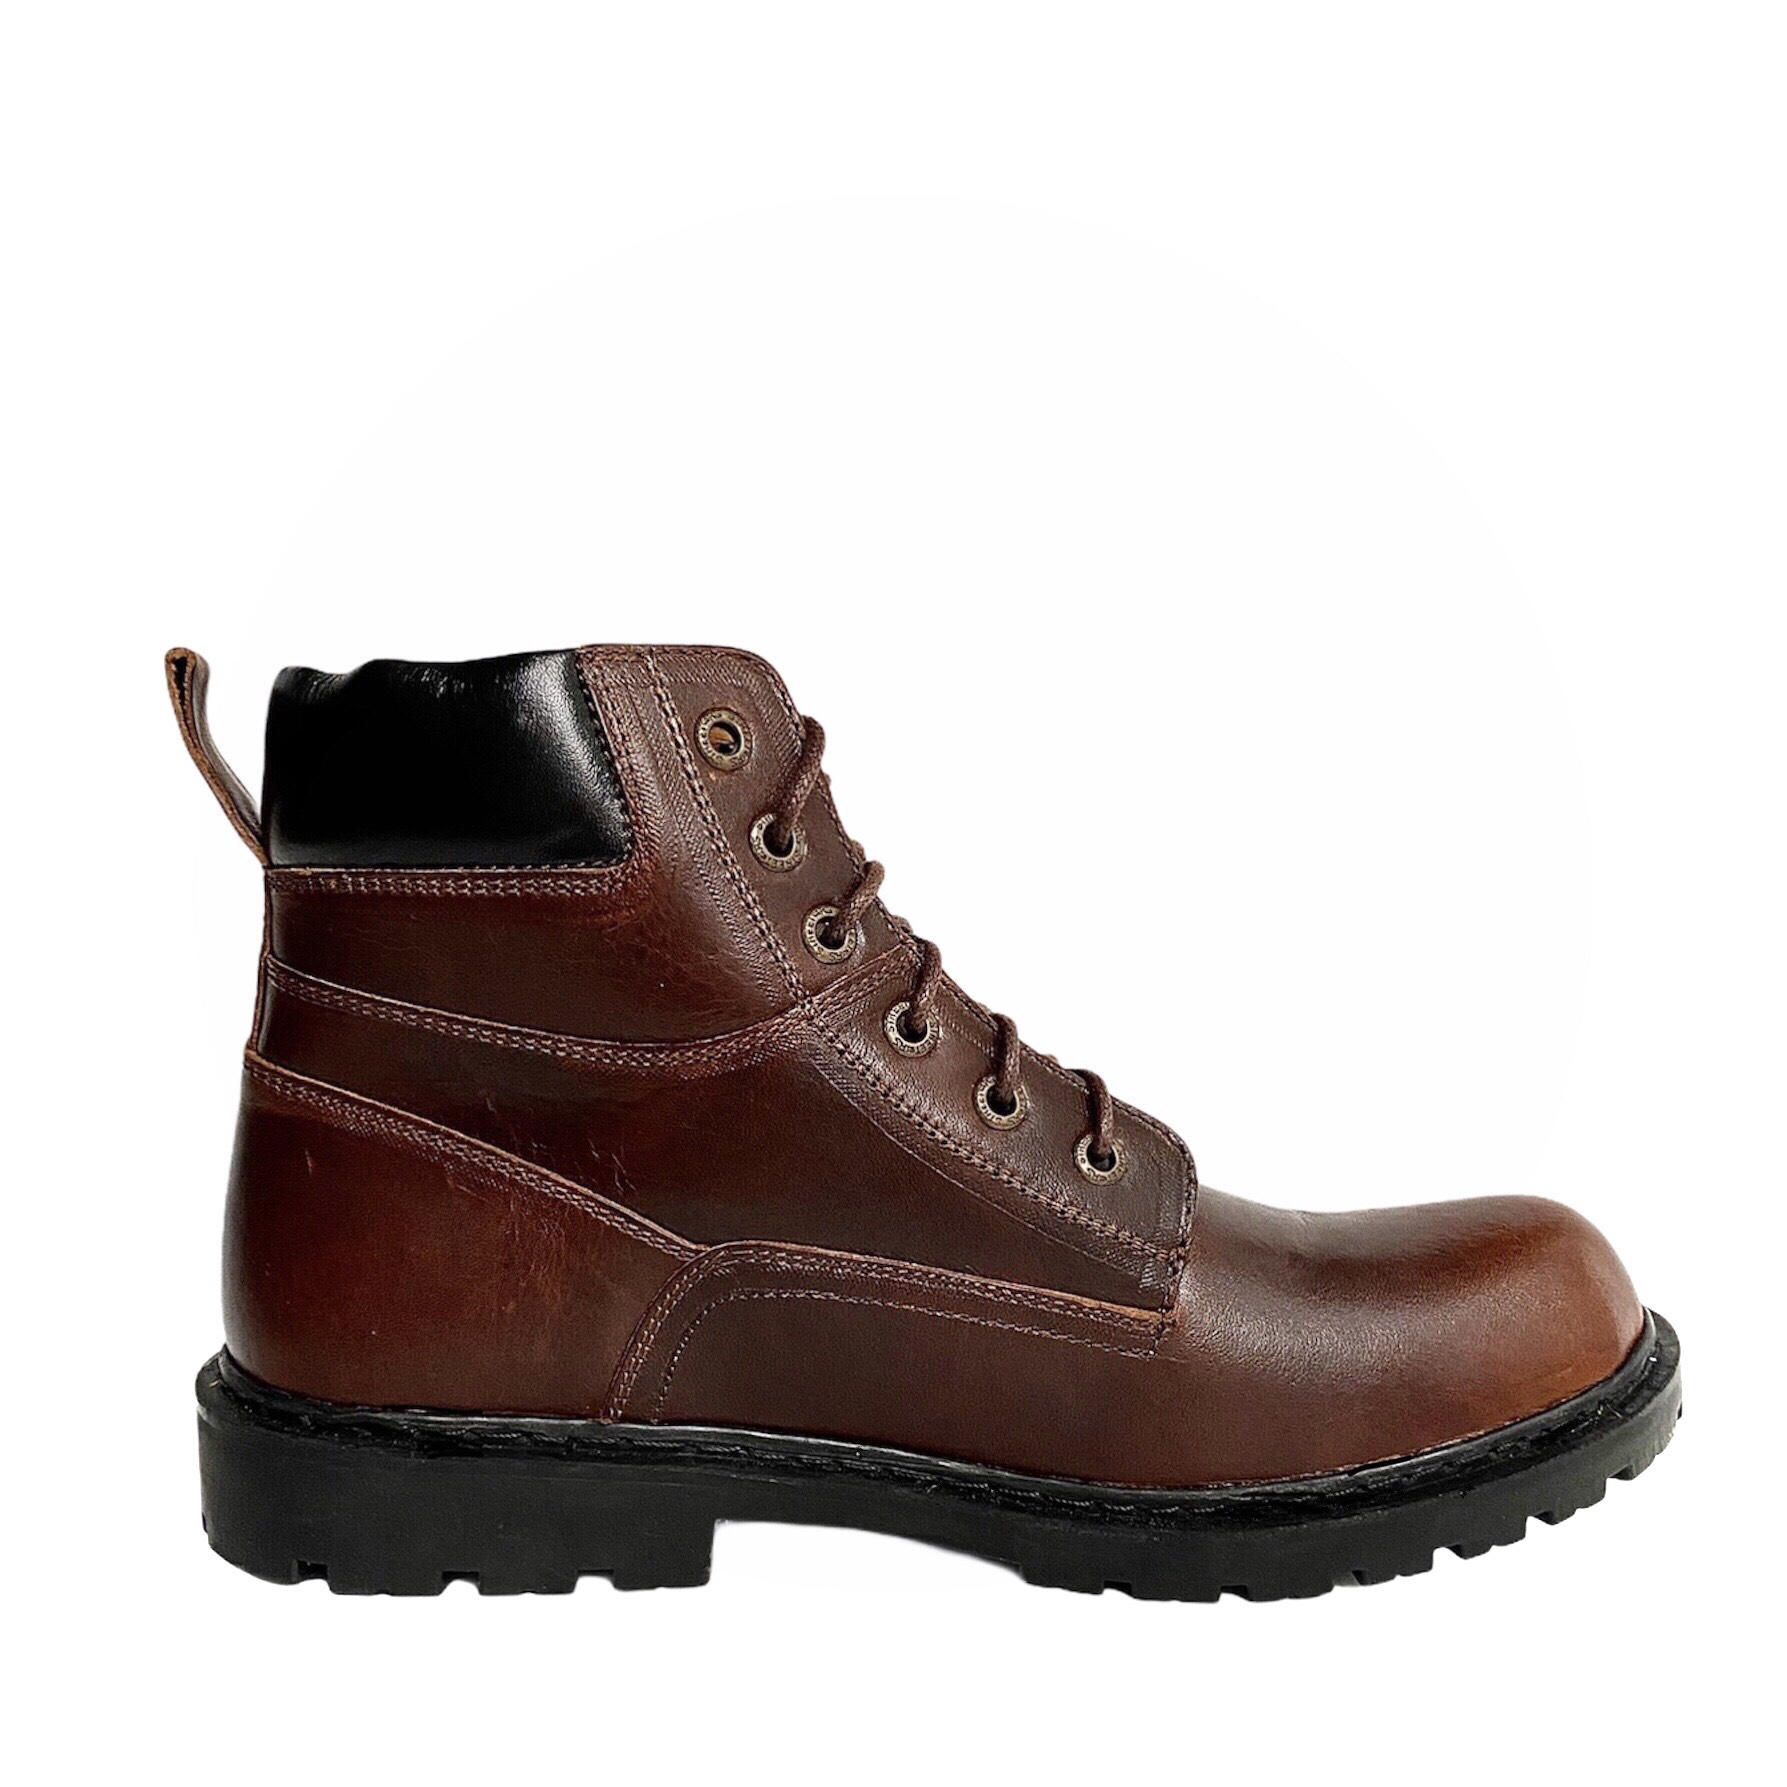 Giày Boots Nam Cổ Cao Da Bò Thật 100% Cao Cấp HN612 Nâu Size 38 - 44